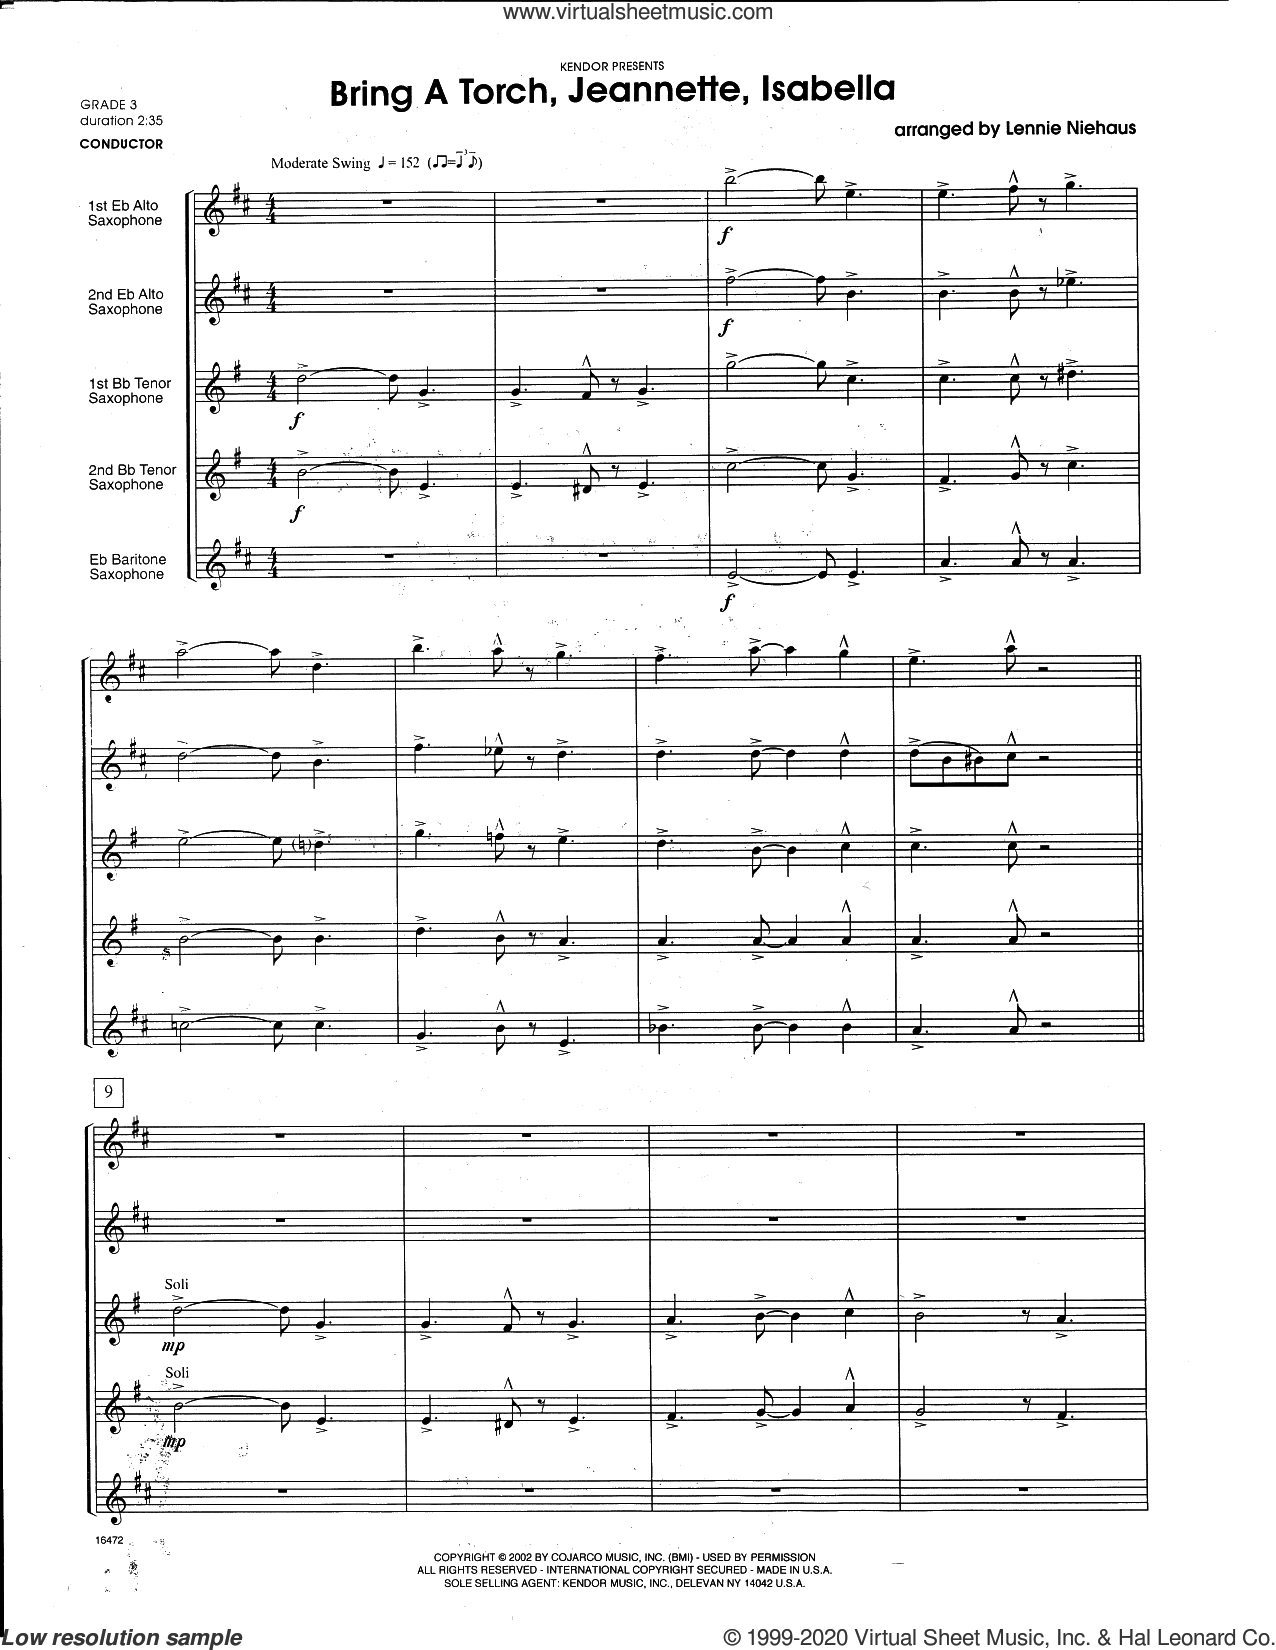 Bring a Torch, Jeannette, Isabella (arr. Lennie Niehaus) (COMPLETE) sheet music for saxophone quintet  and Lennie Niehaus, intermediate skill level